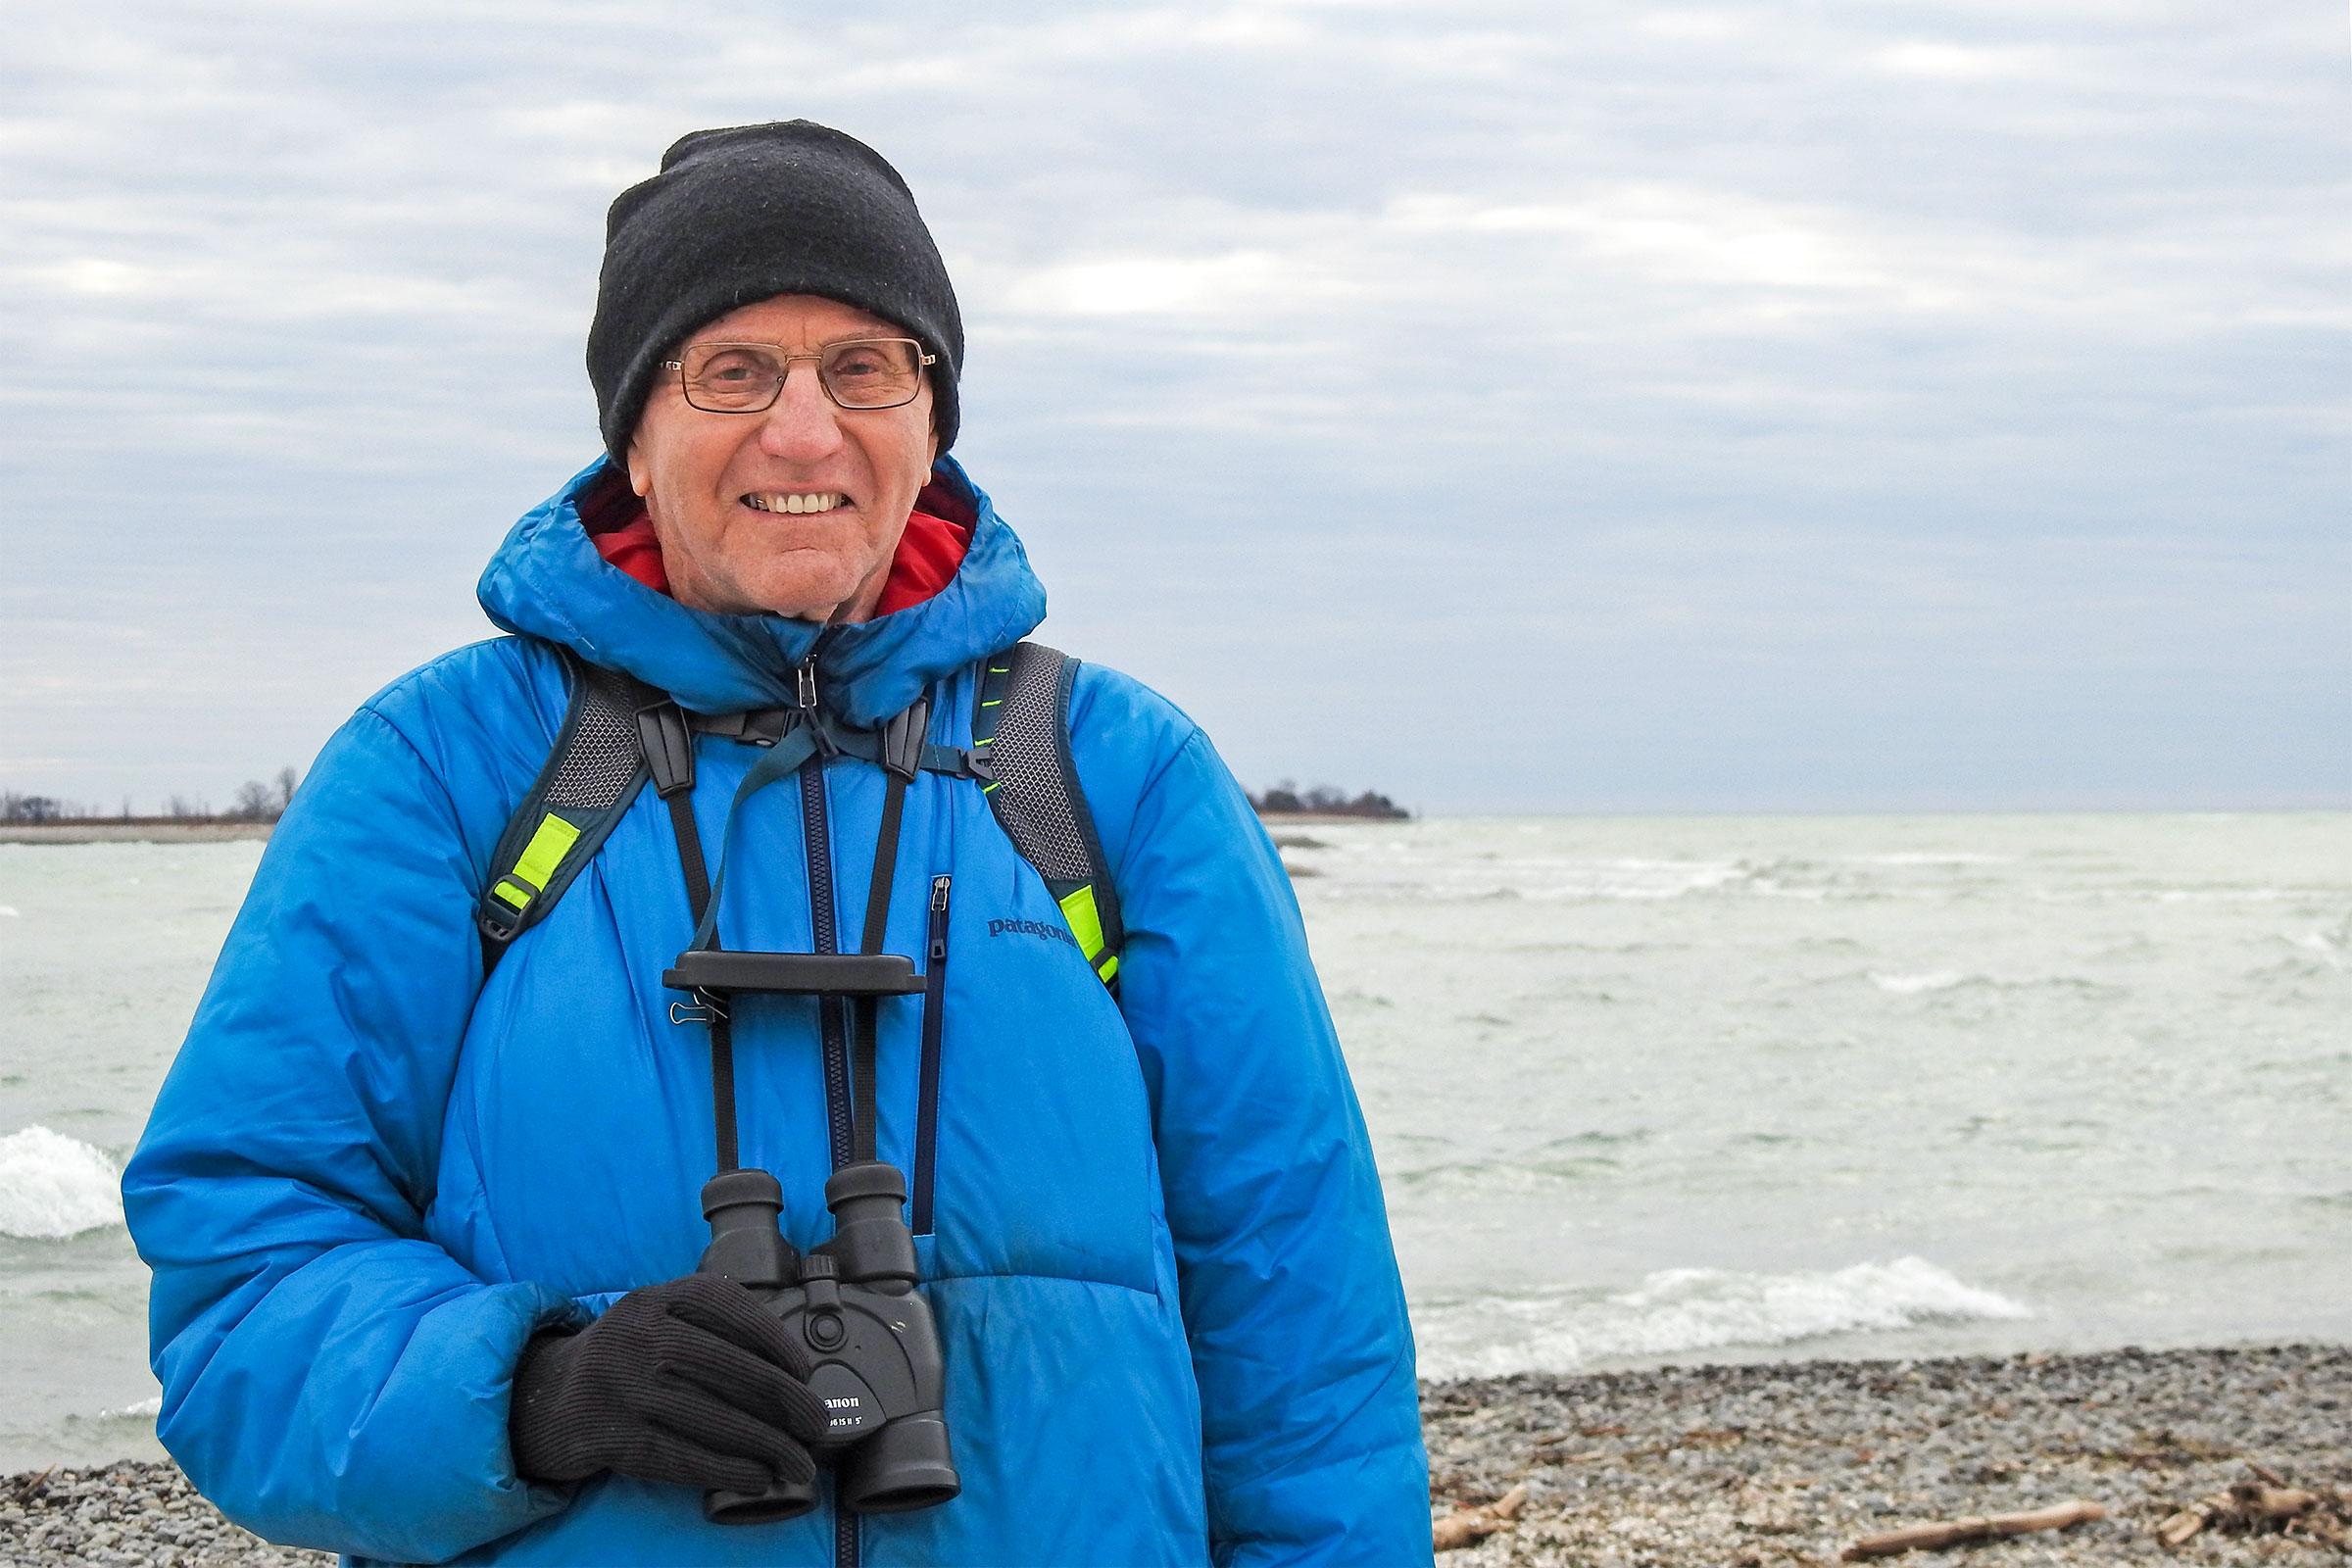 Ron Pittaway birding at Presqu'ile Provincial Park on Lake Ontario. Jean Iron